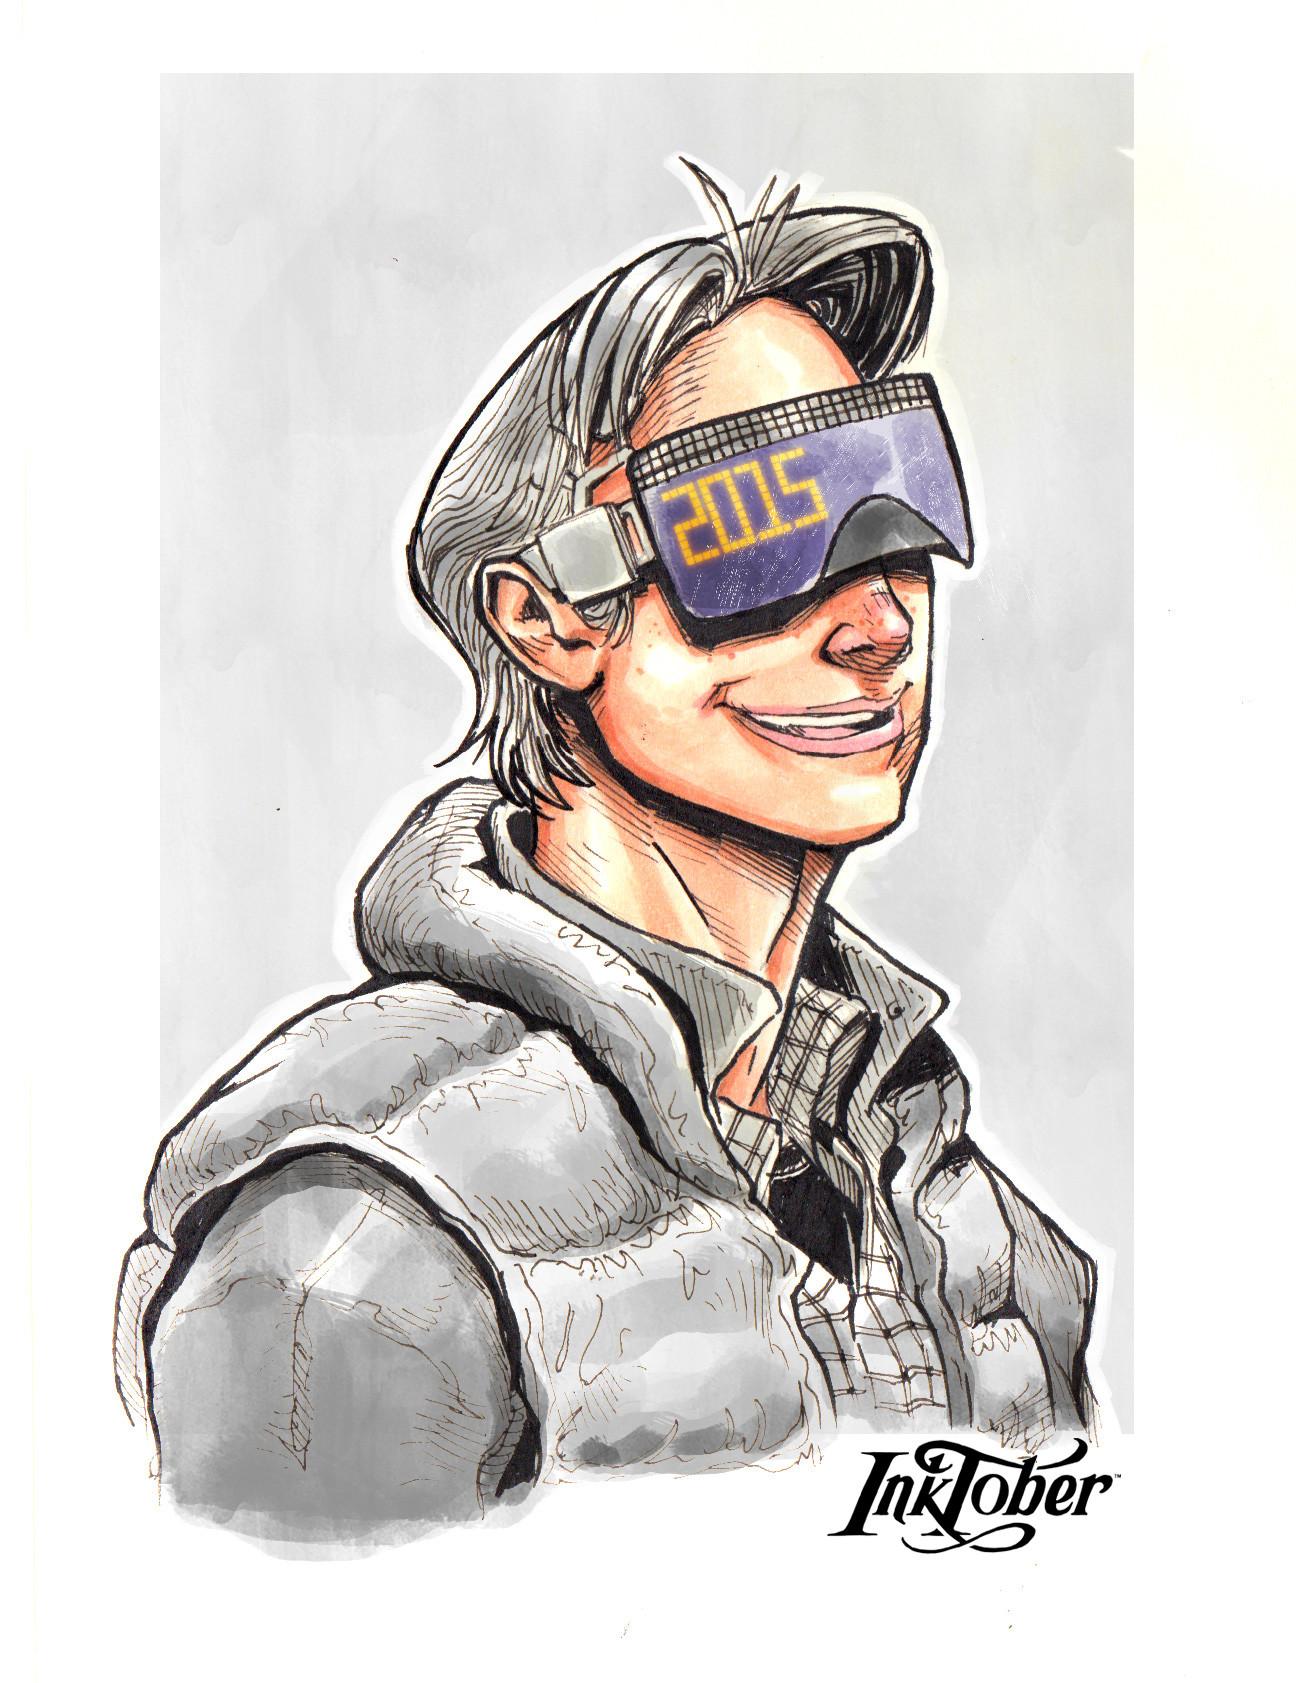 Josh matts inktober18 b